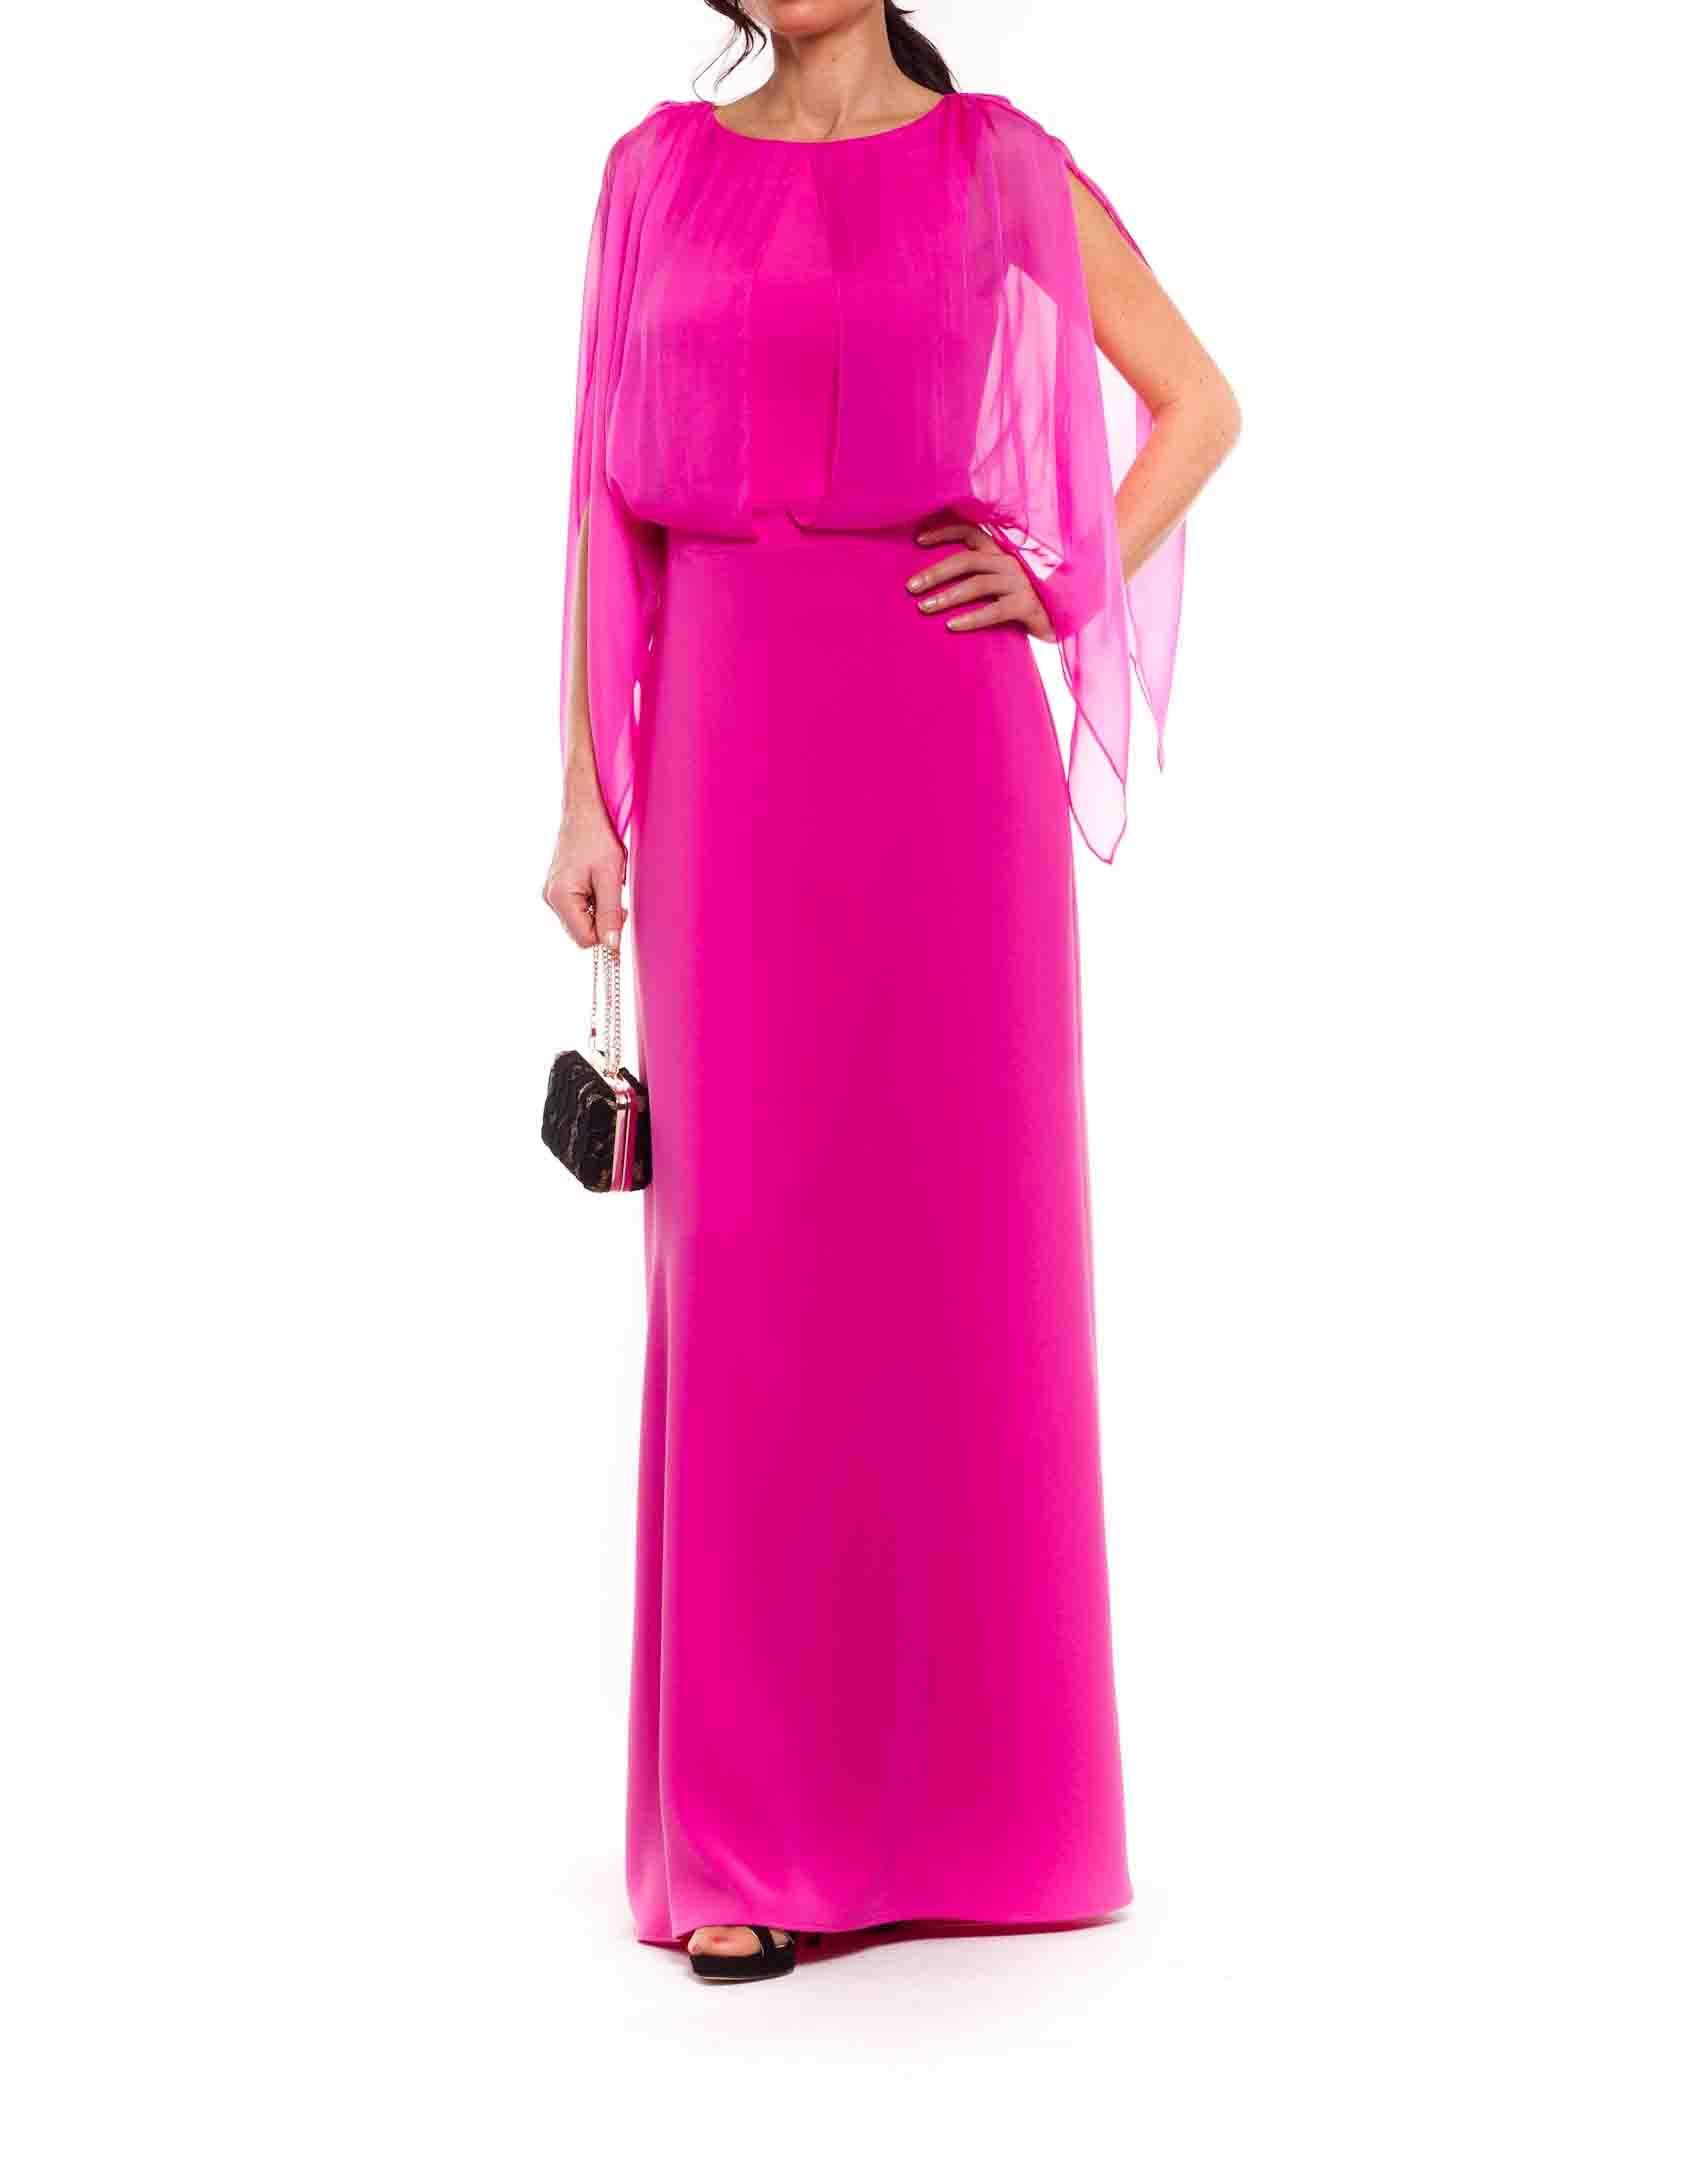 Vestidos de fiesta roberto verino 2013 – Moda Española moderna